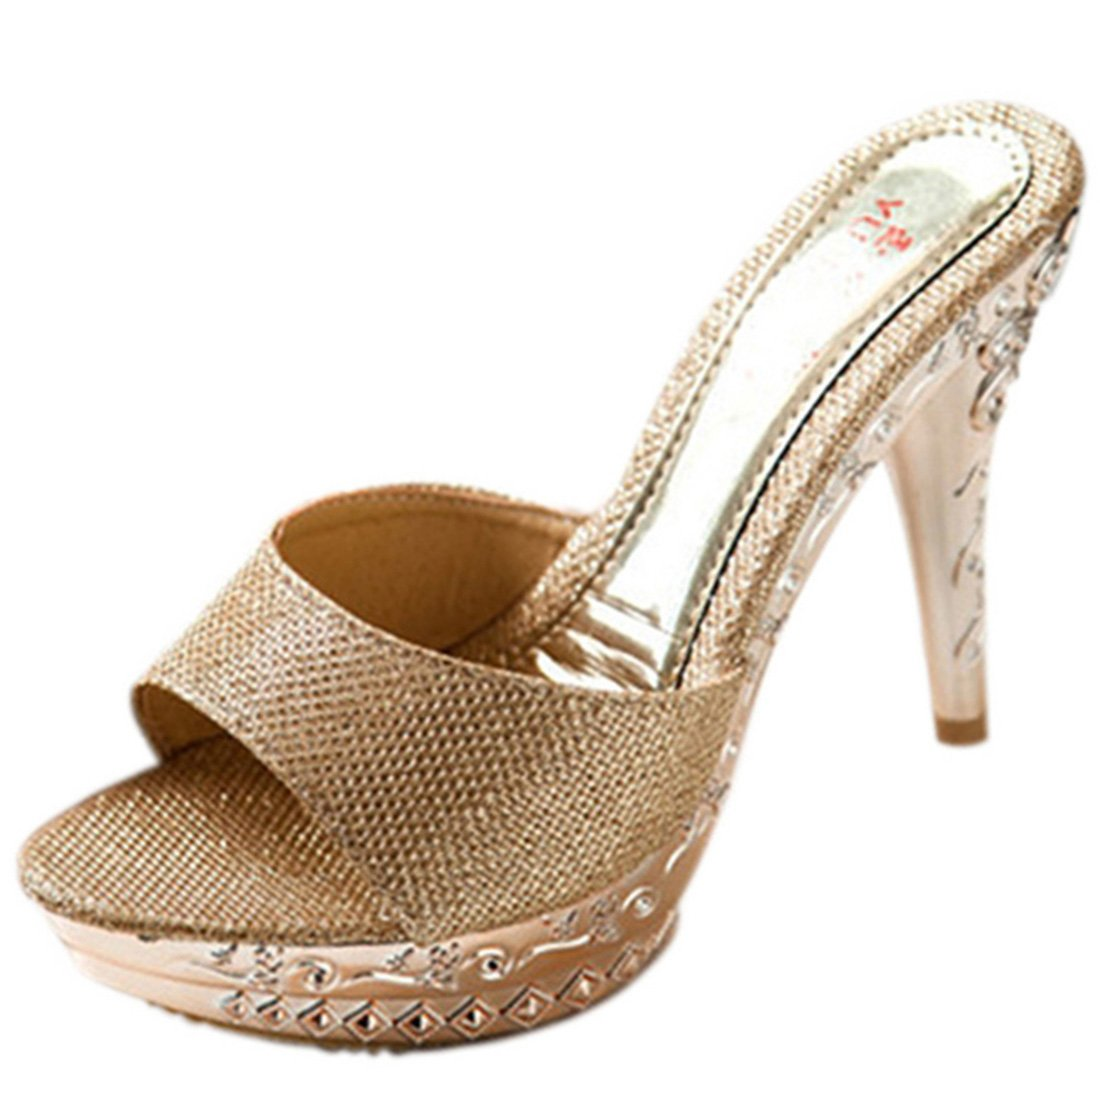 9ba855fac15 Jiyaru Women PU Sandal High Heel Slipper Open Toe Slide Dress Sandal Gold  US7.5  Amazon.ca  Shoes   Handbags